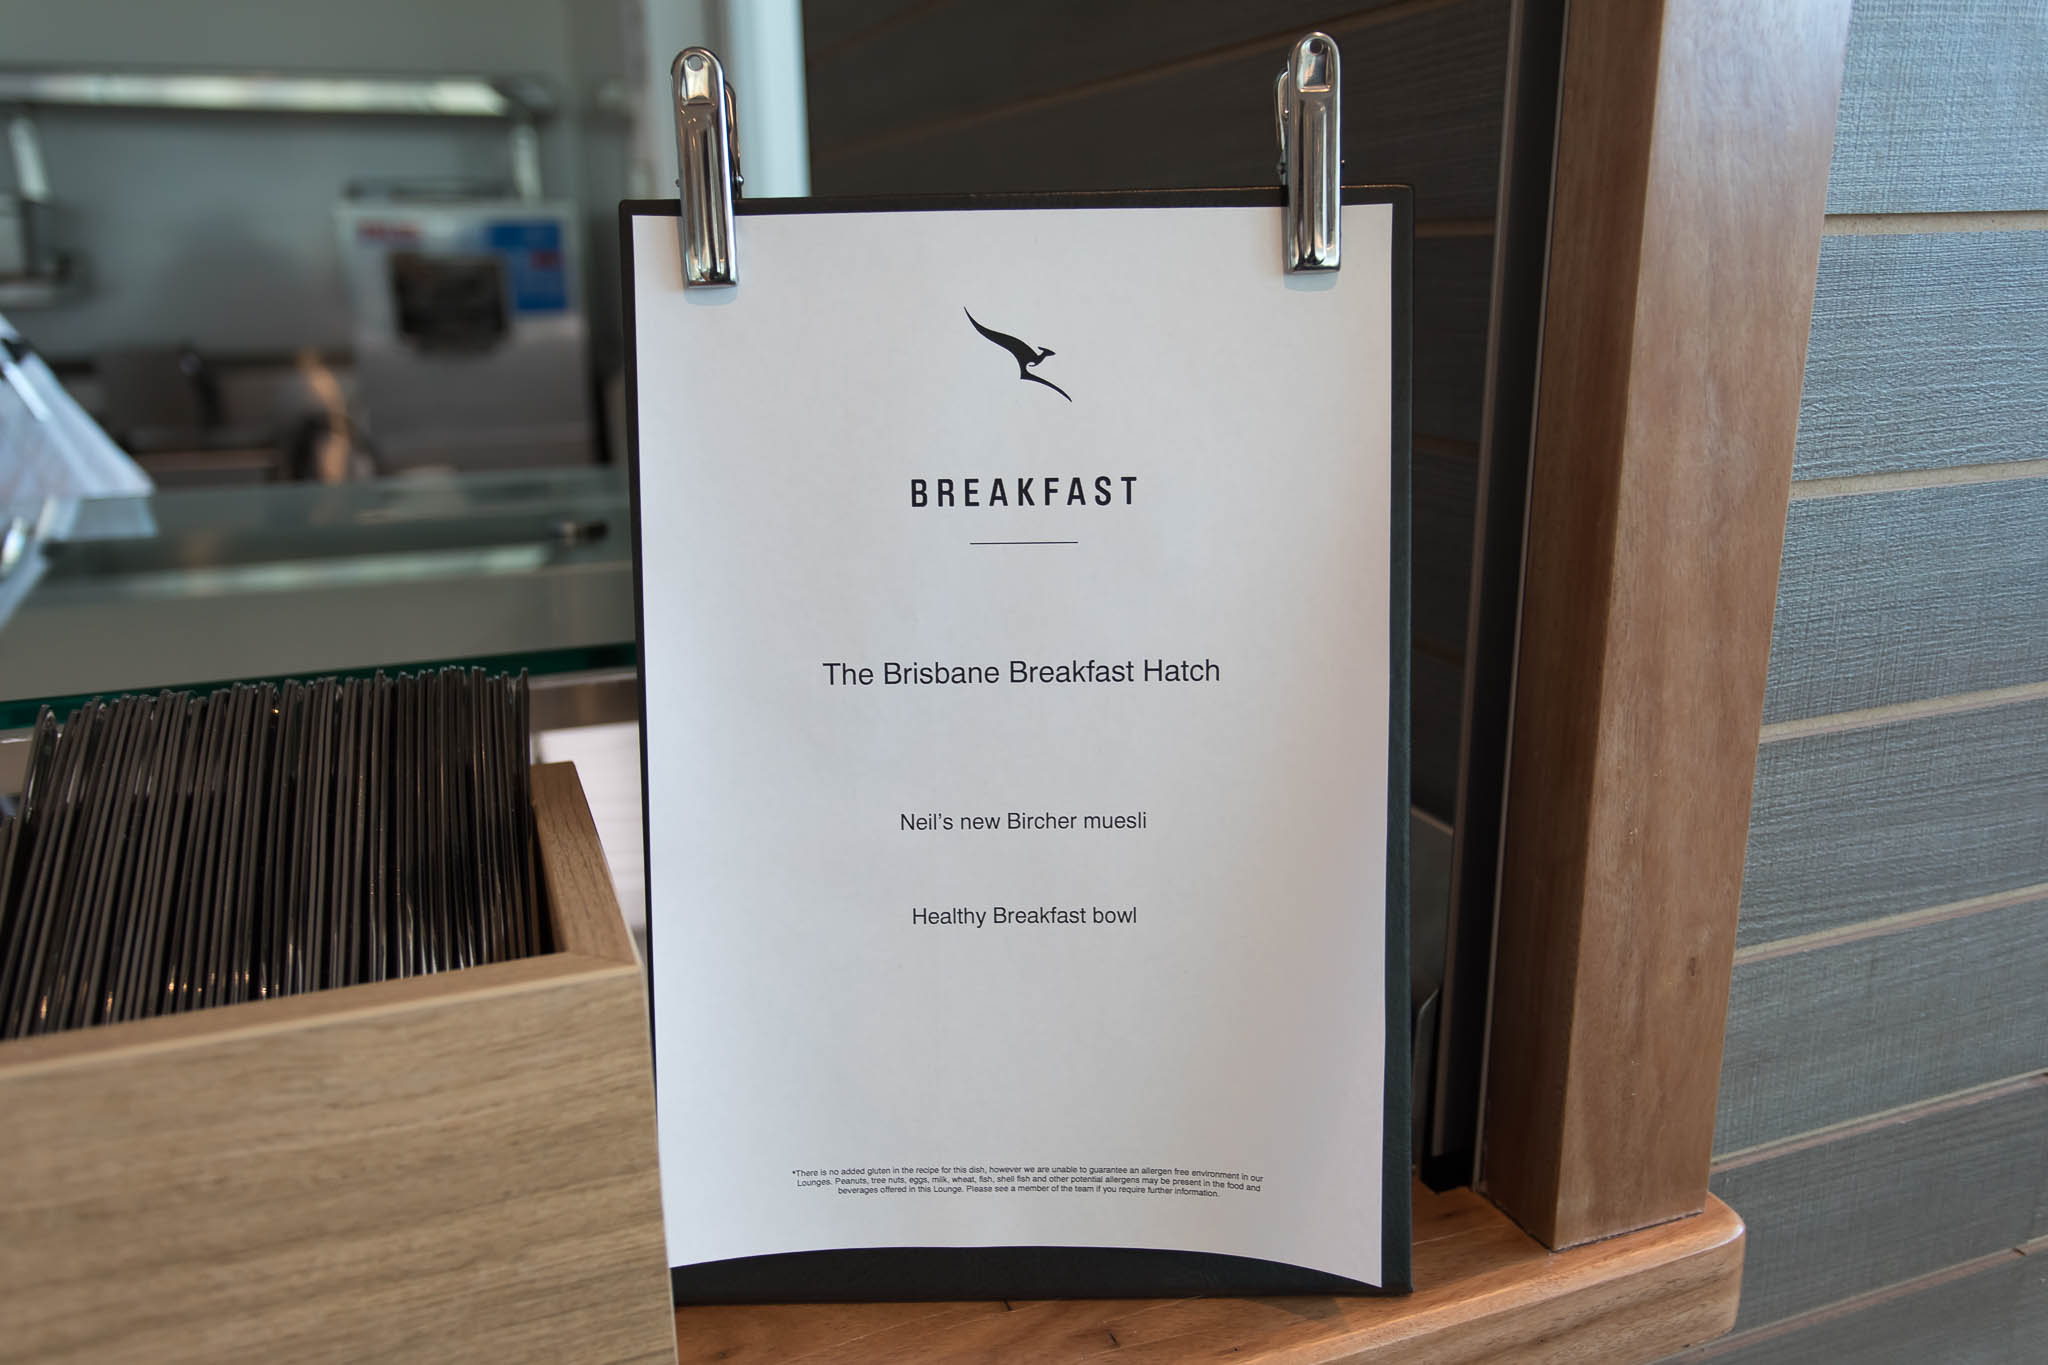 Qantas Brisbane International Lounge Level 2 Breakfast Hatch Menu